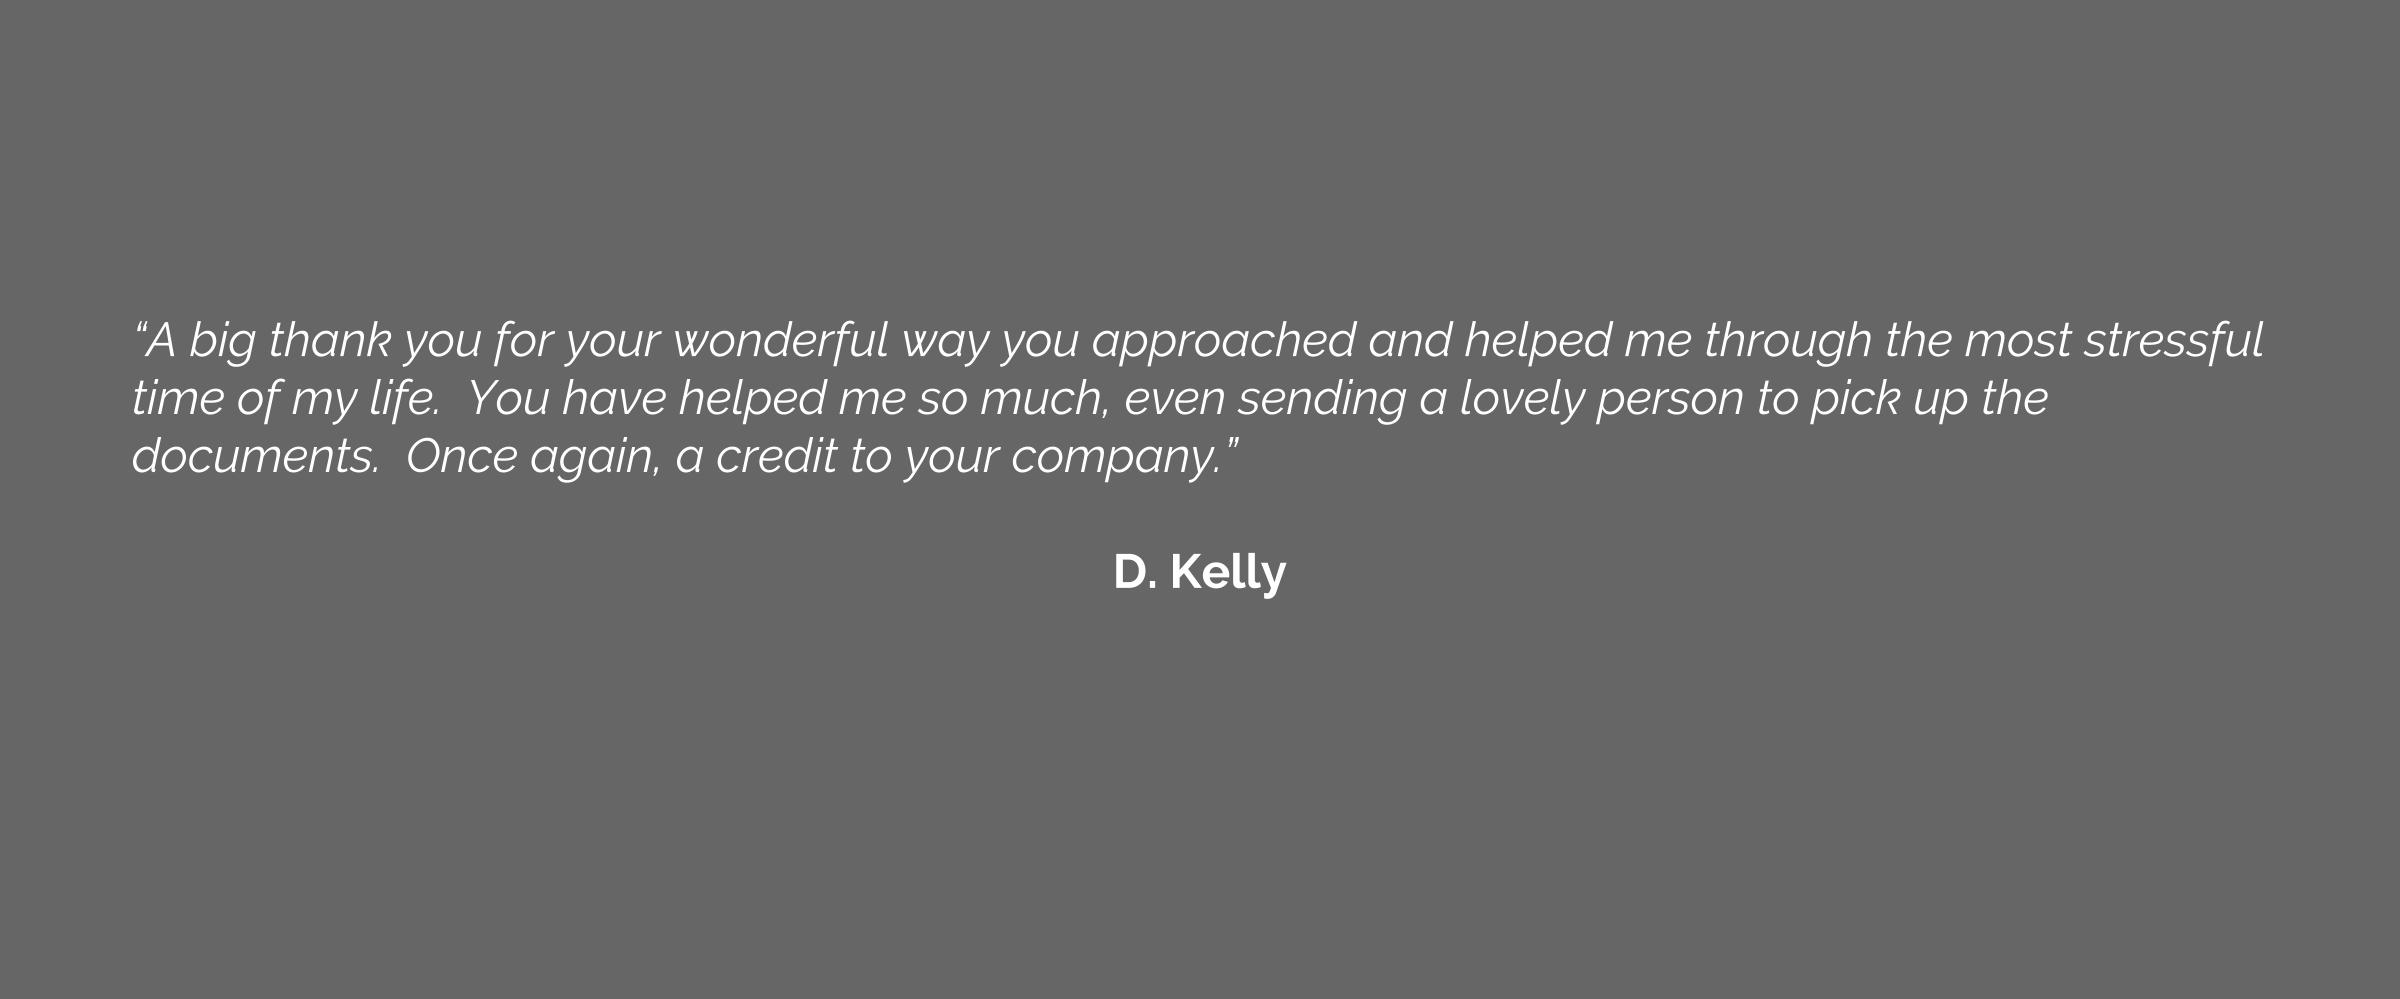 D Kelly Testimonial.png